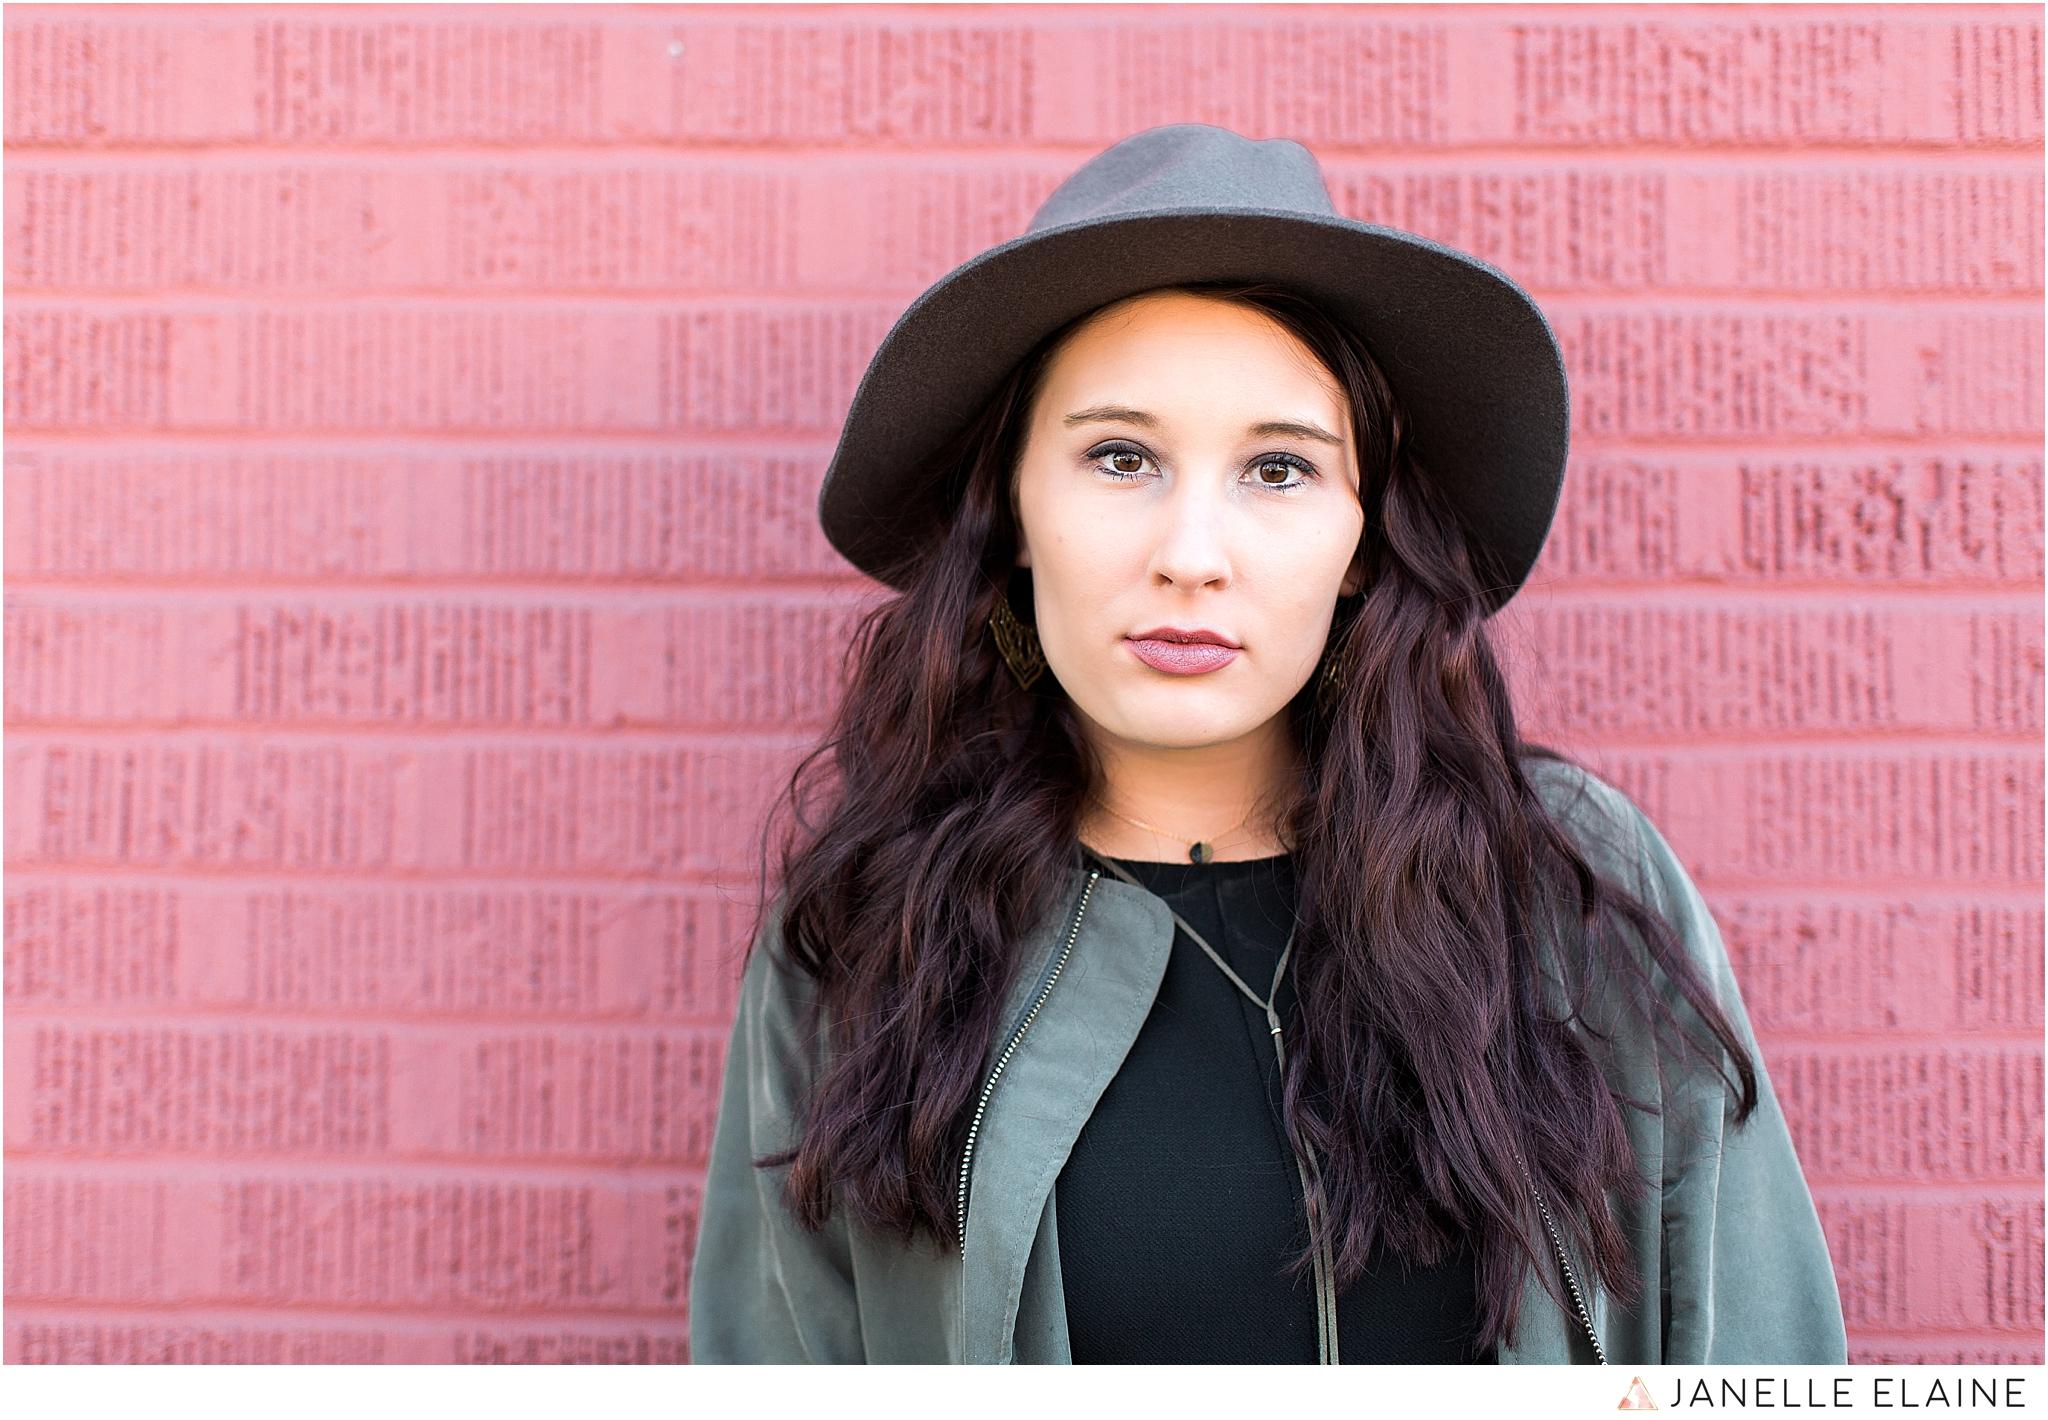 janelle elaine photography-seattle portrait photographer-washington-Hannah-5.jpg